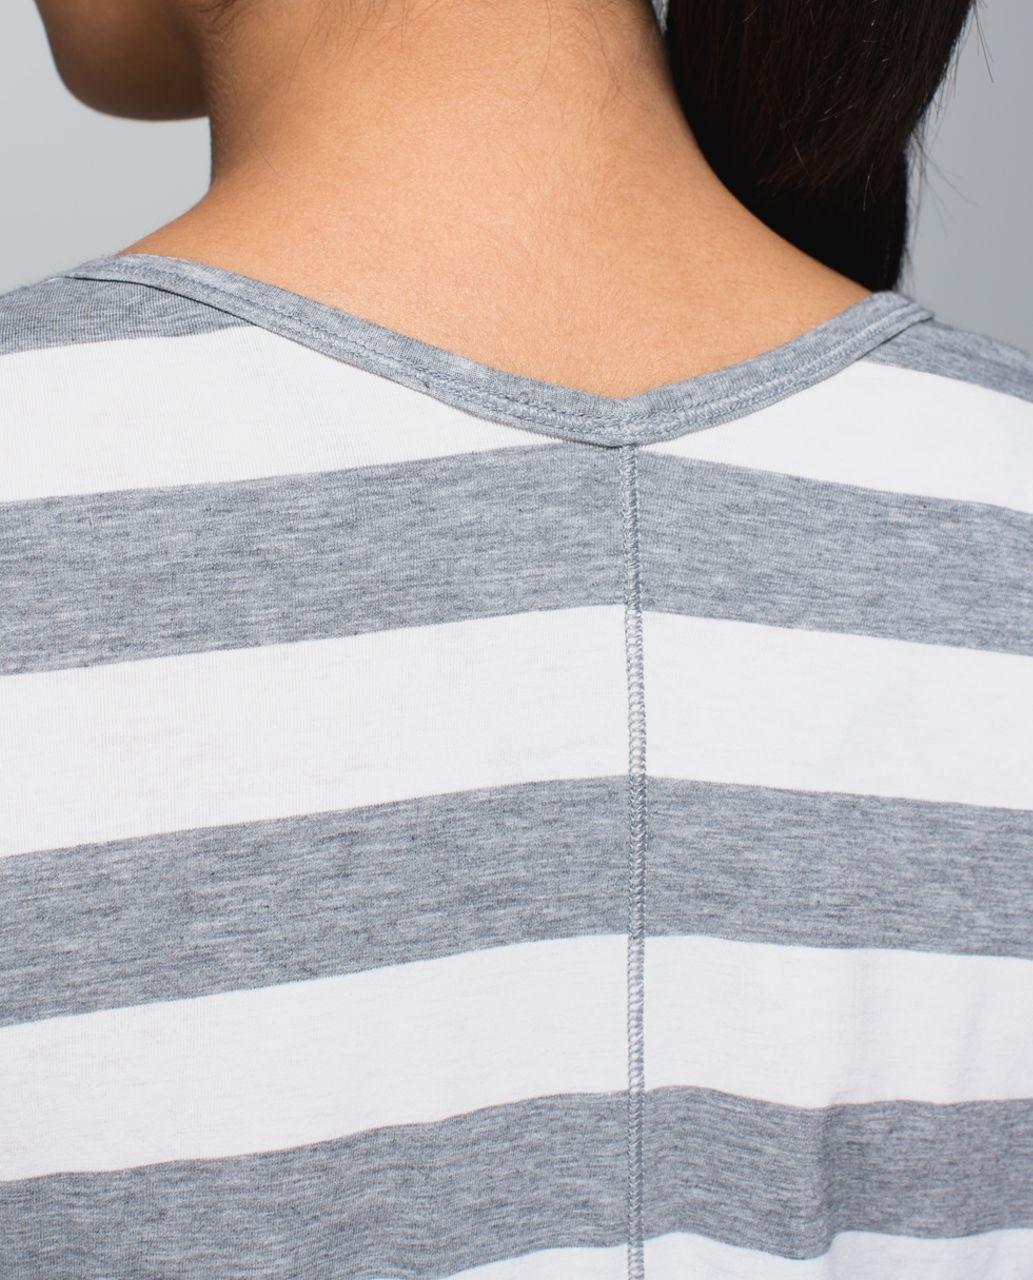 Lululemon Yogini 5 Year Long Sleeve Tee - Straightup Stripe Heathered Medium Grey Heathered Angel White / Almost Pear